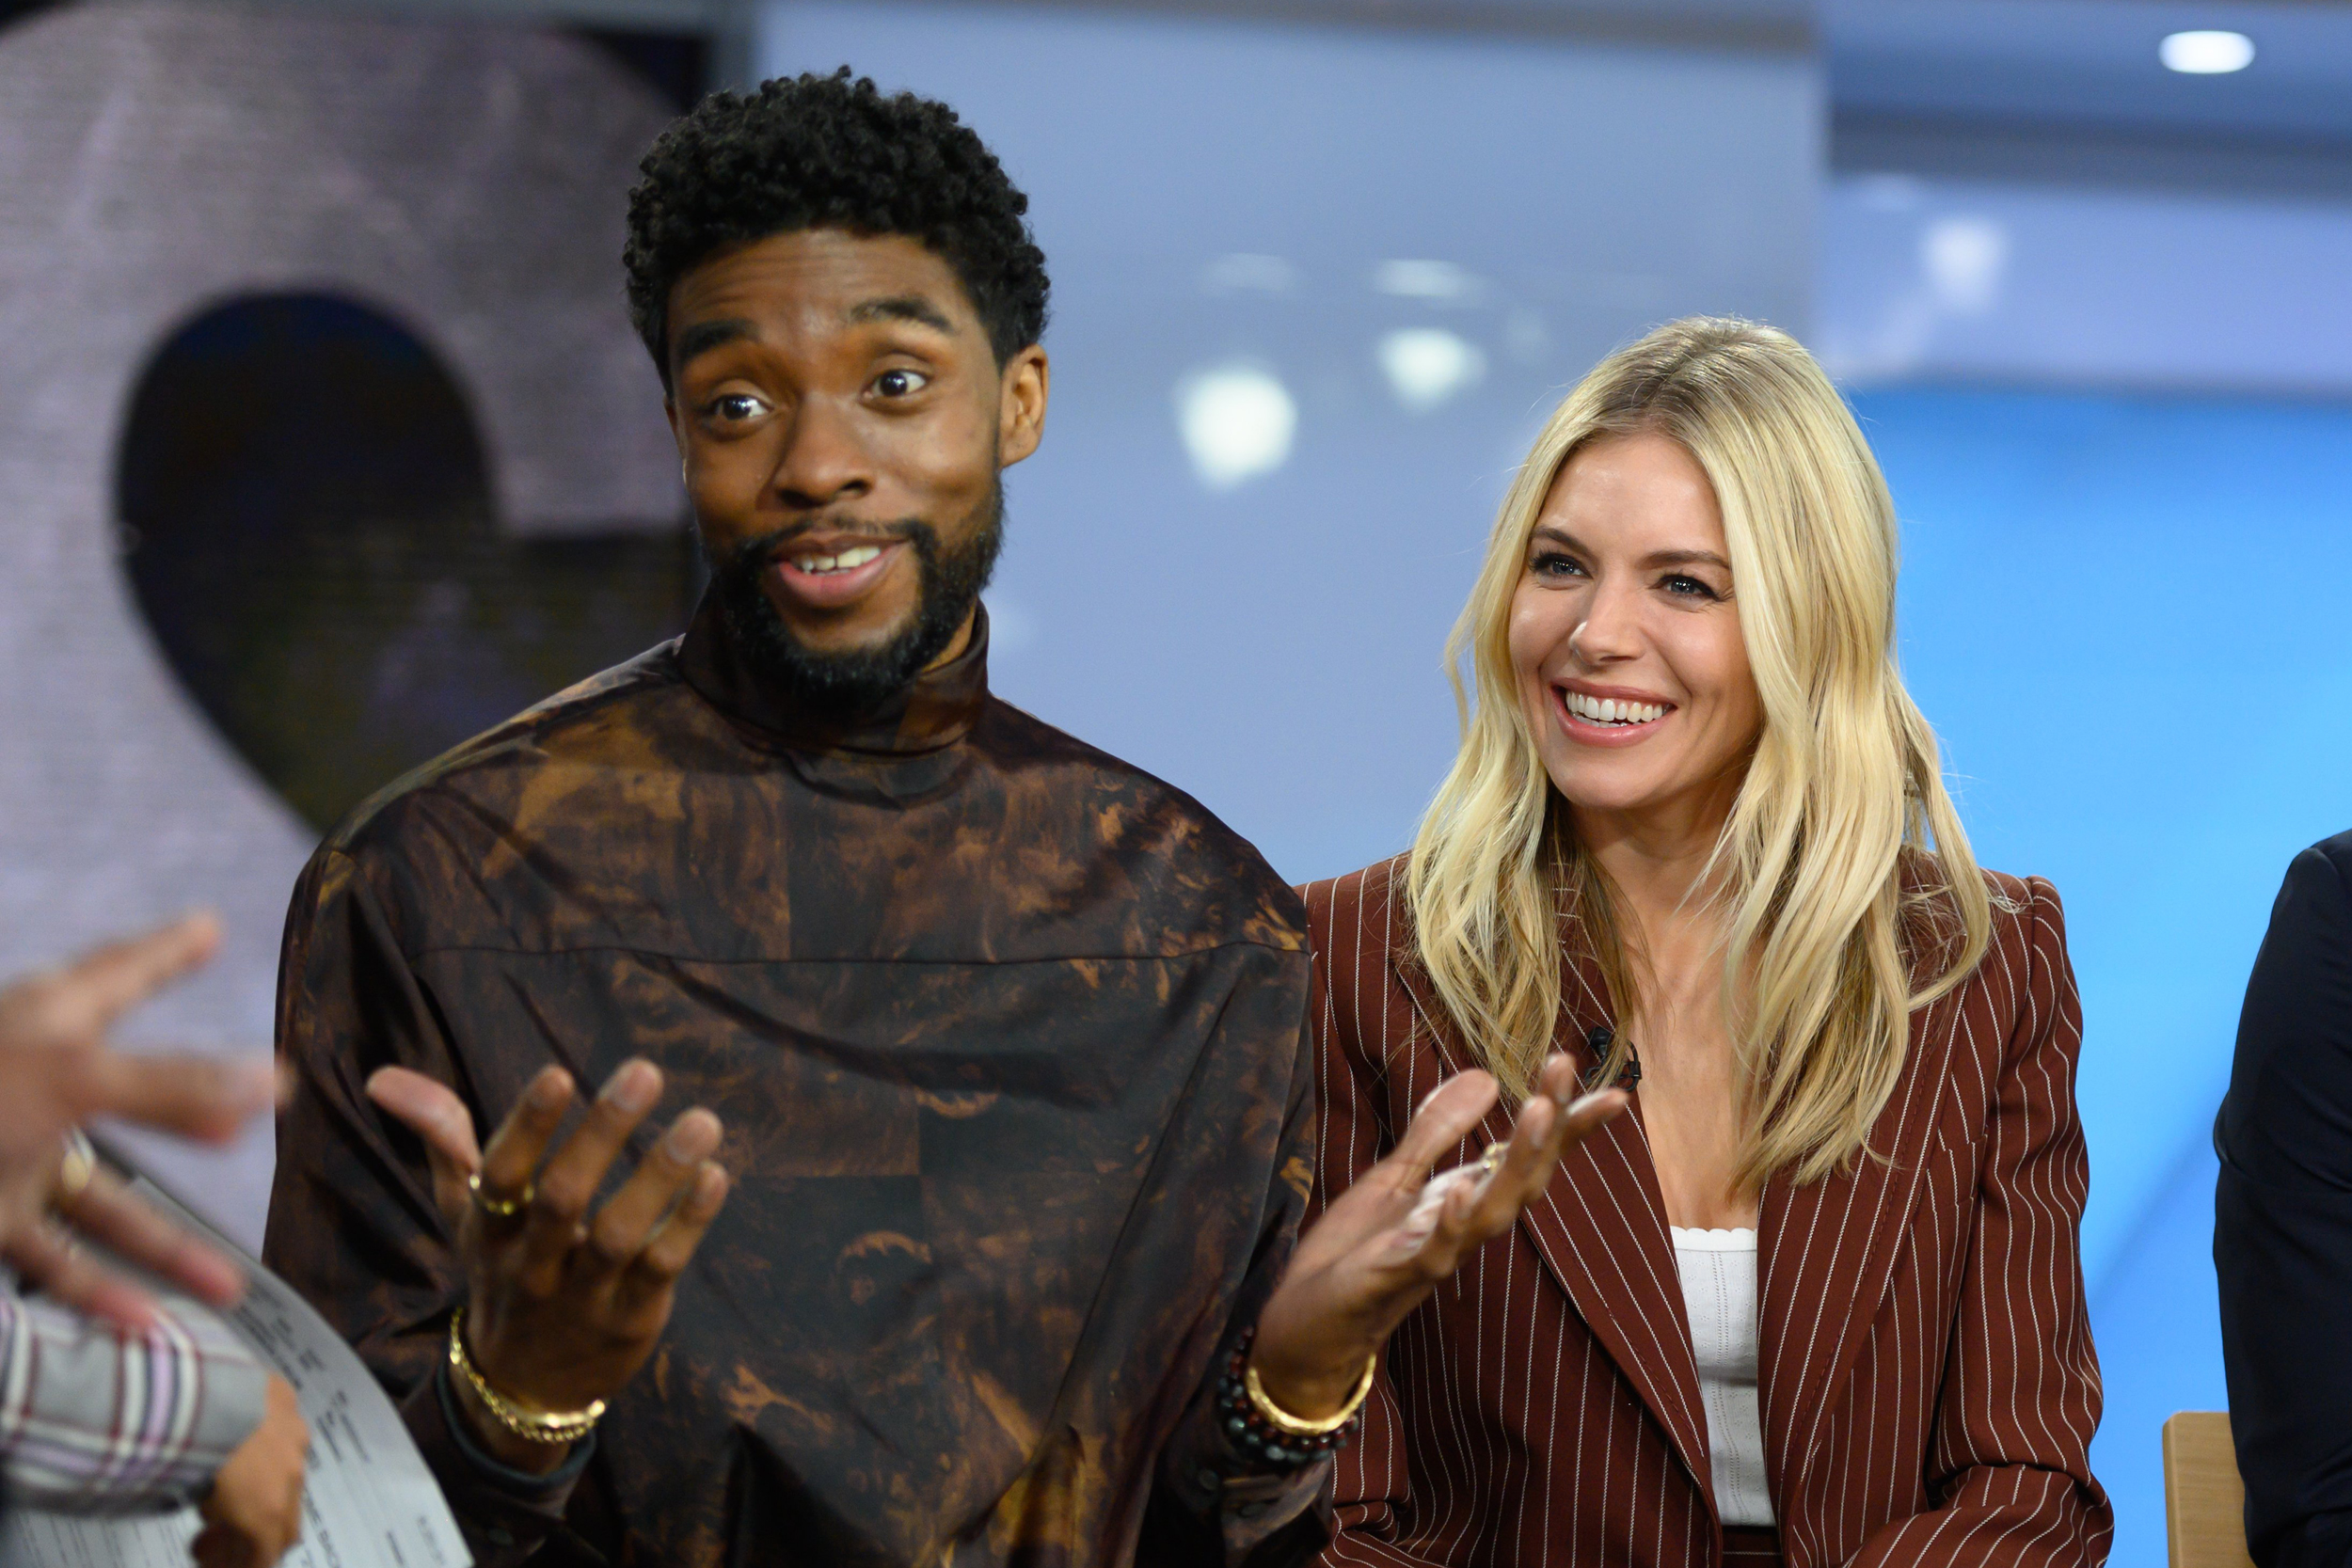 Chadwick Boseman took pay cut to boost Sienna Miller's salary on '21 Bridges'